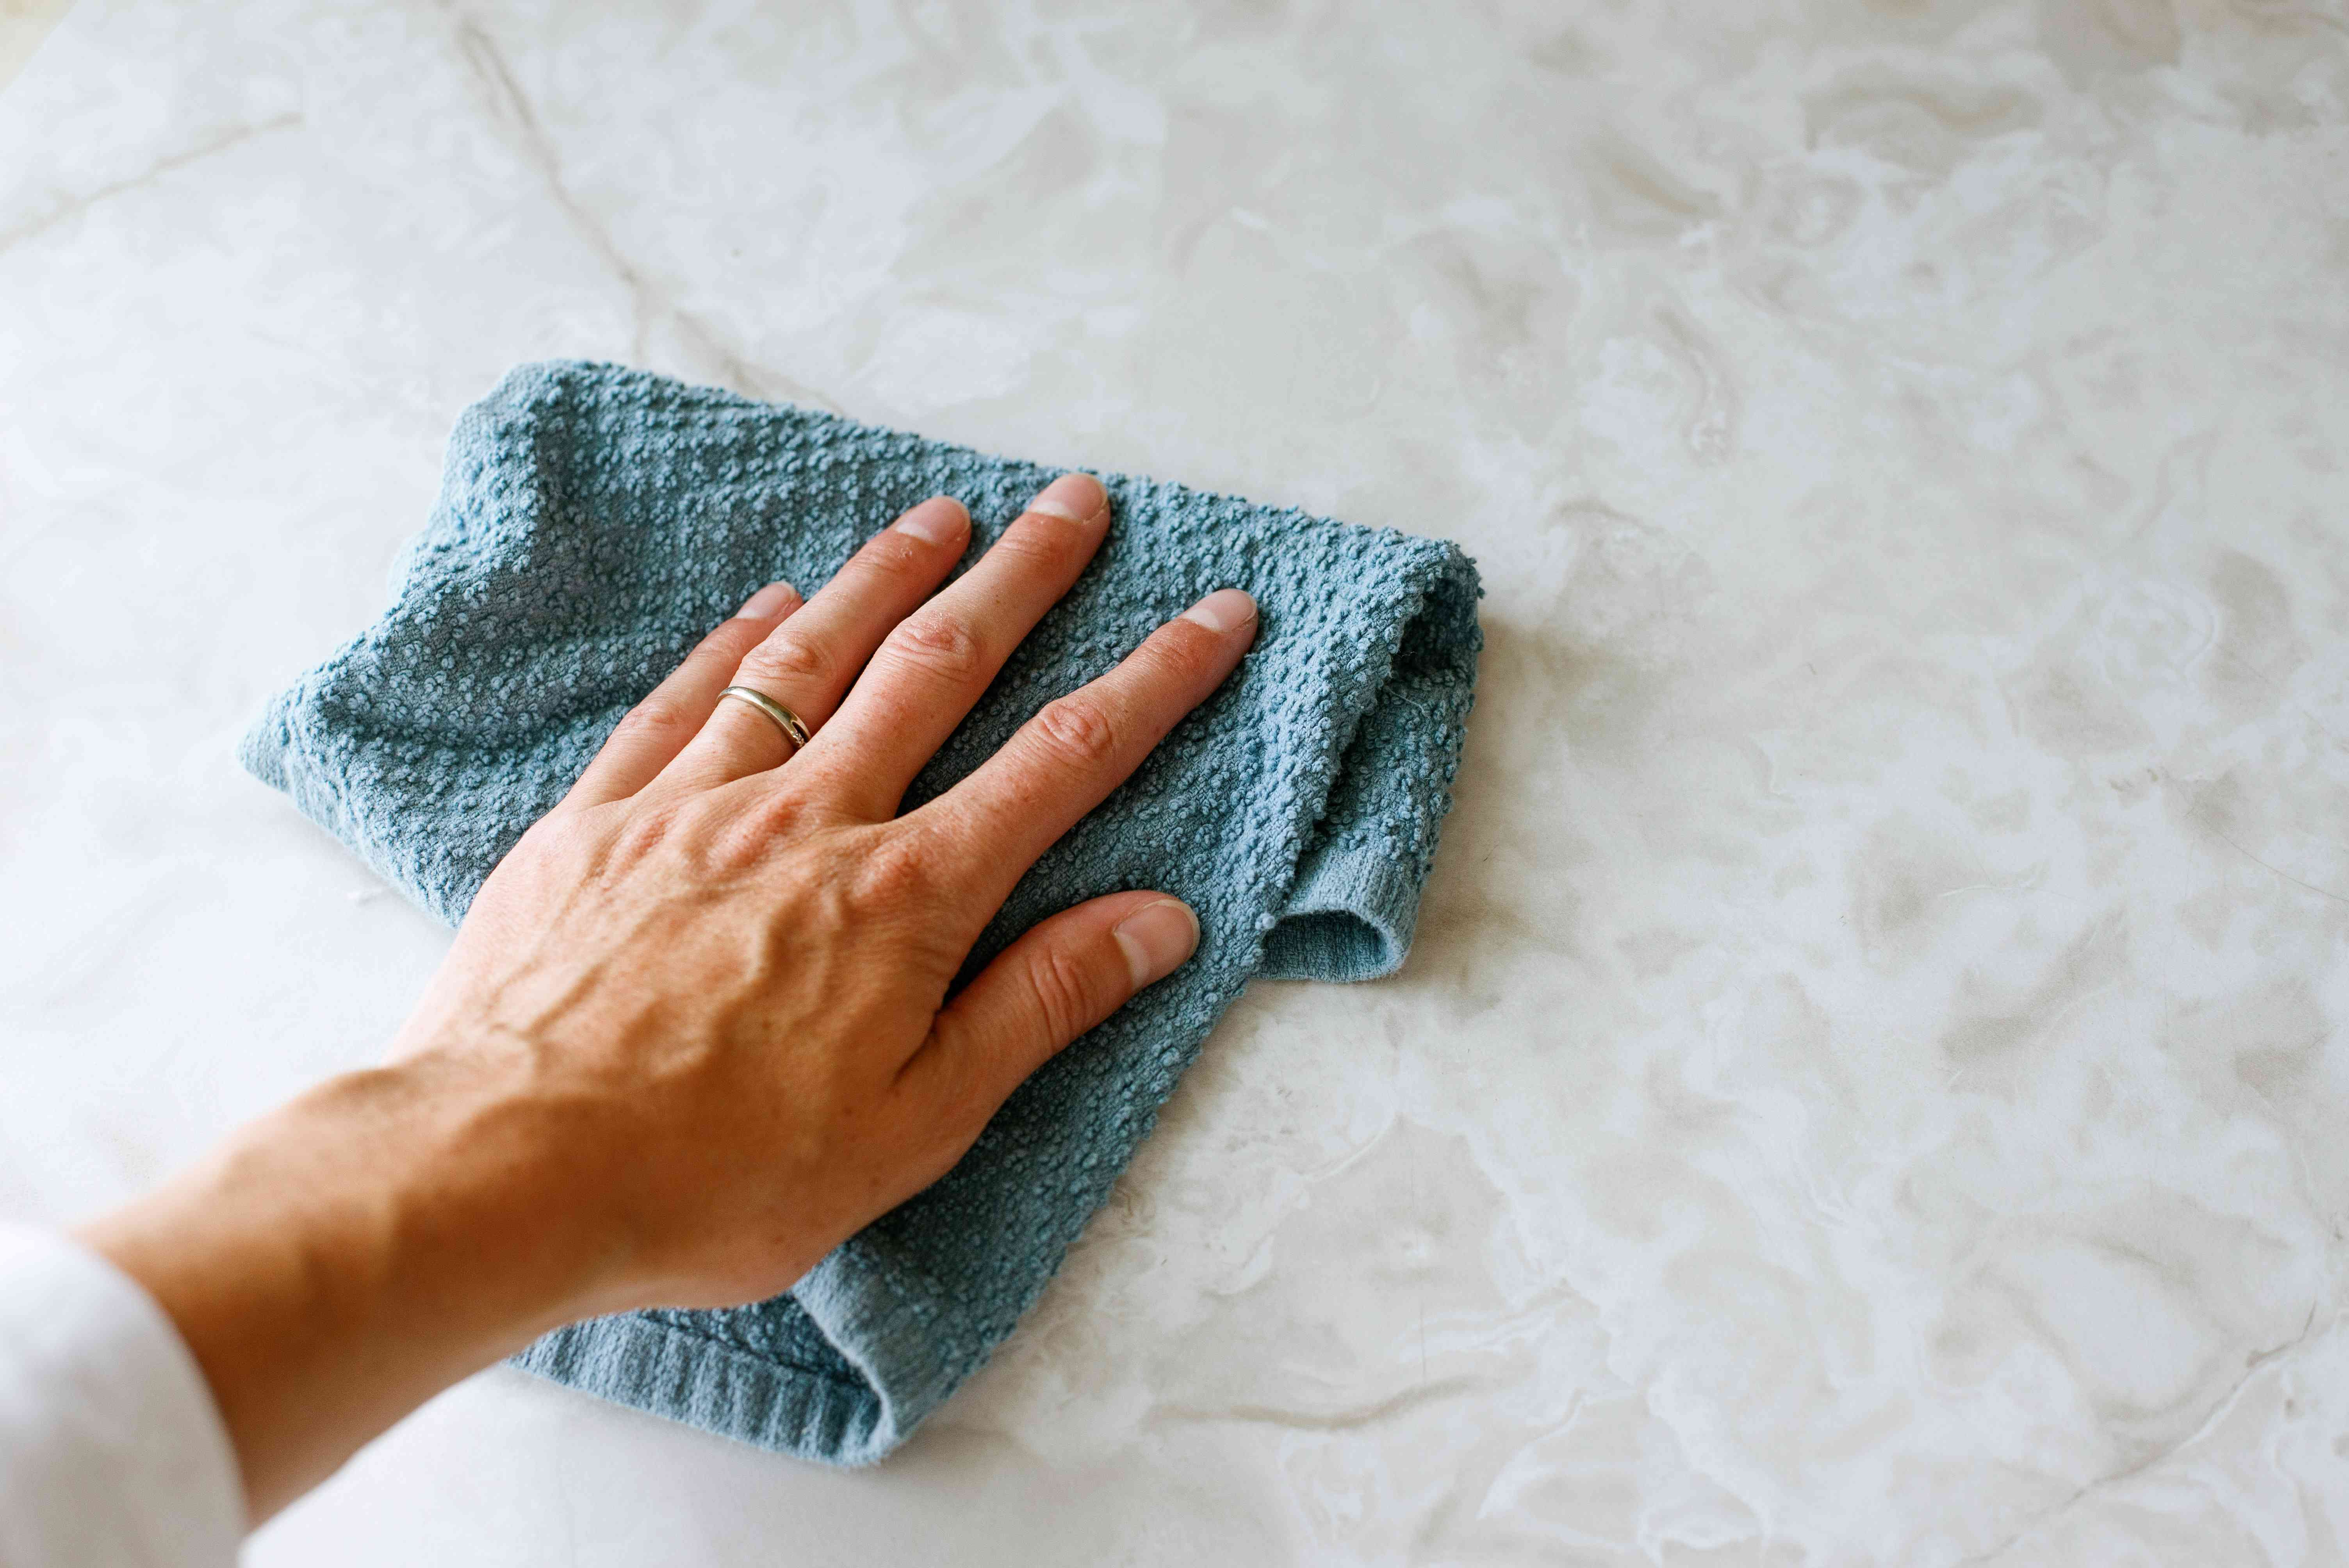 Old blue rag wiping down washing machine before using